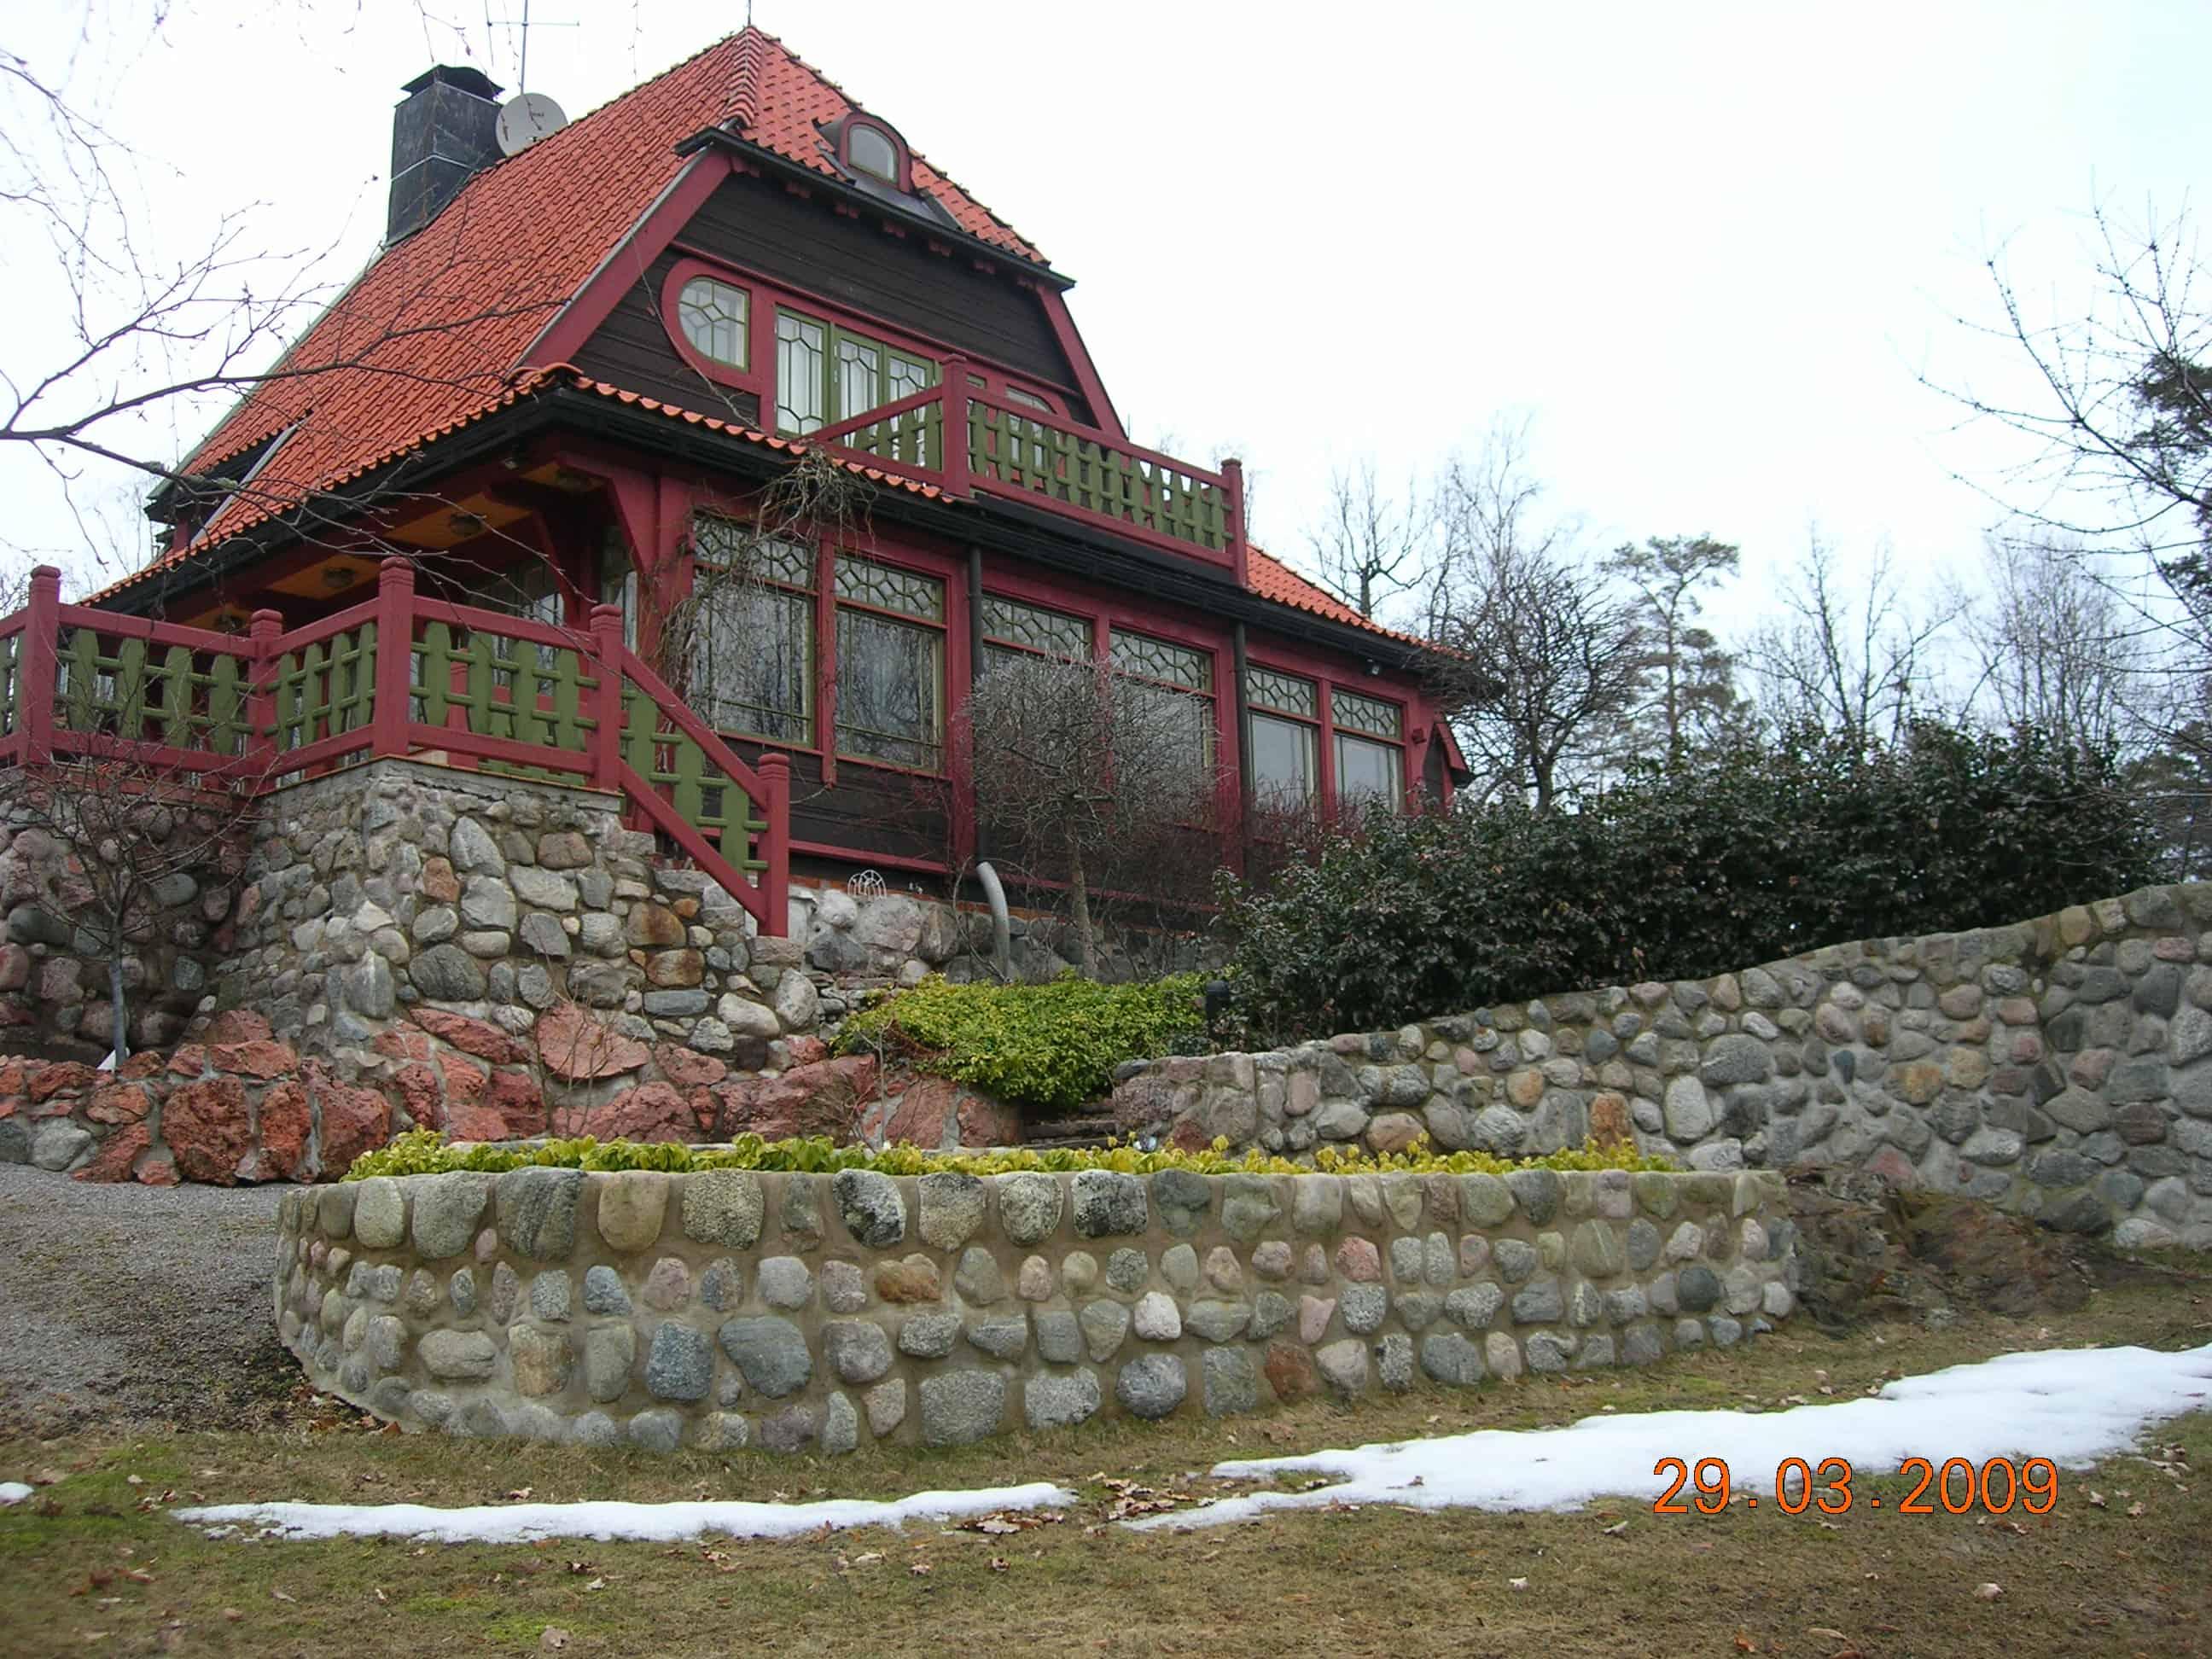 "Referensjobb ""Stort hus + mur"" utfört av Moreby AB"